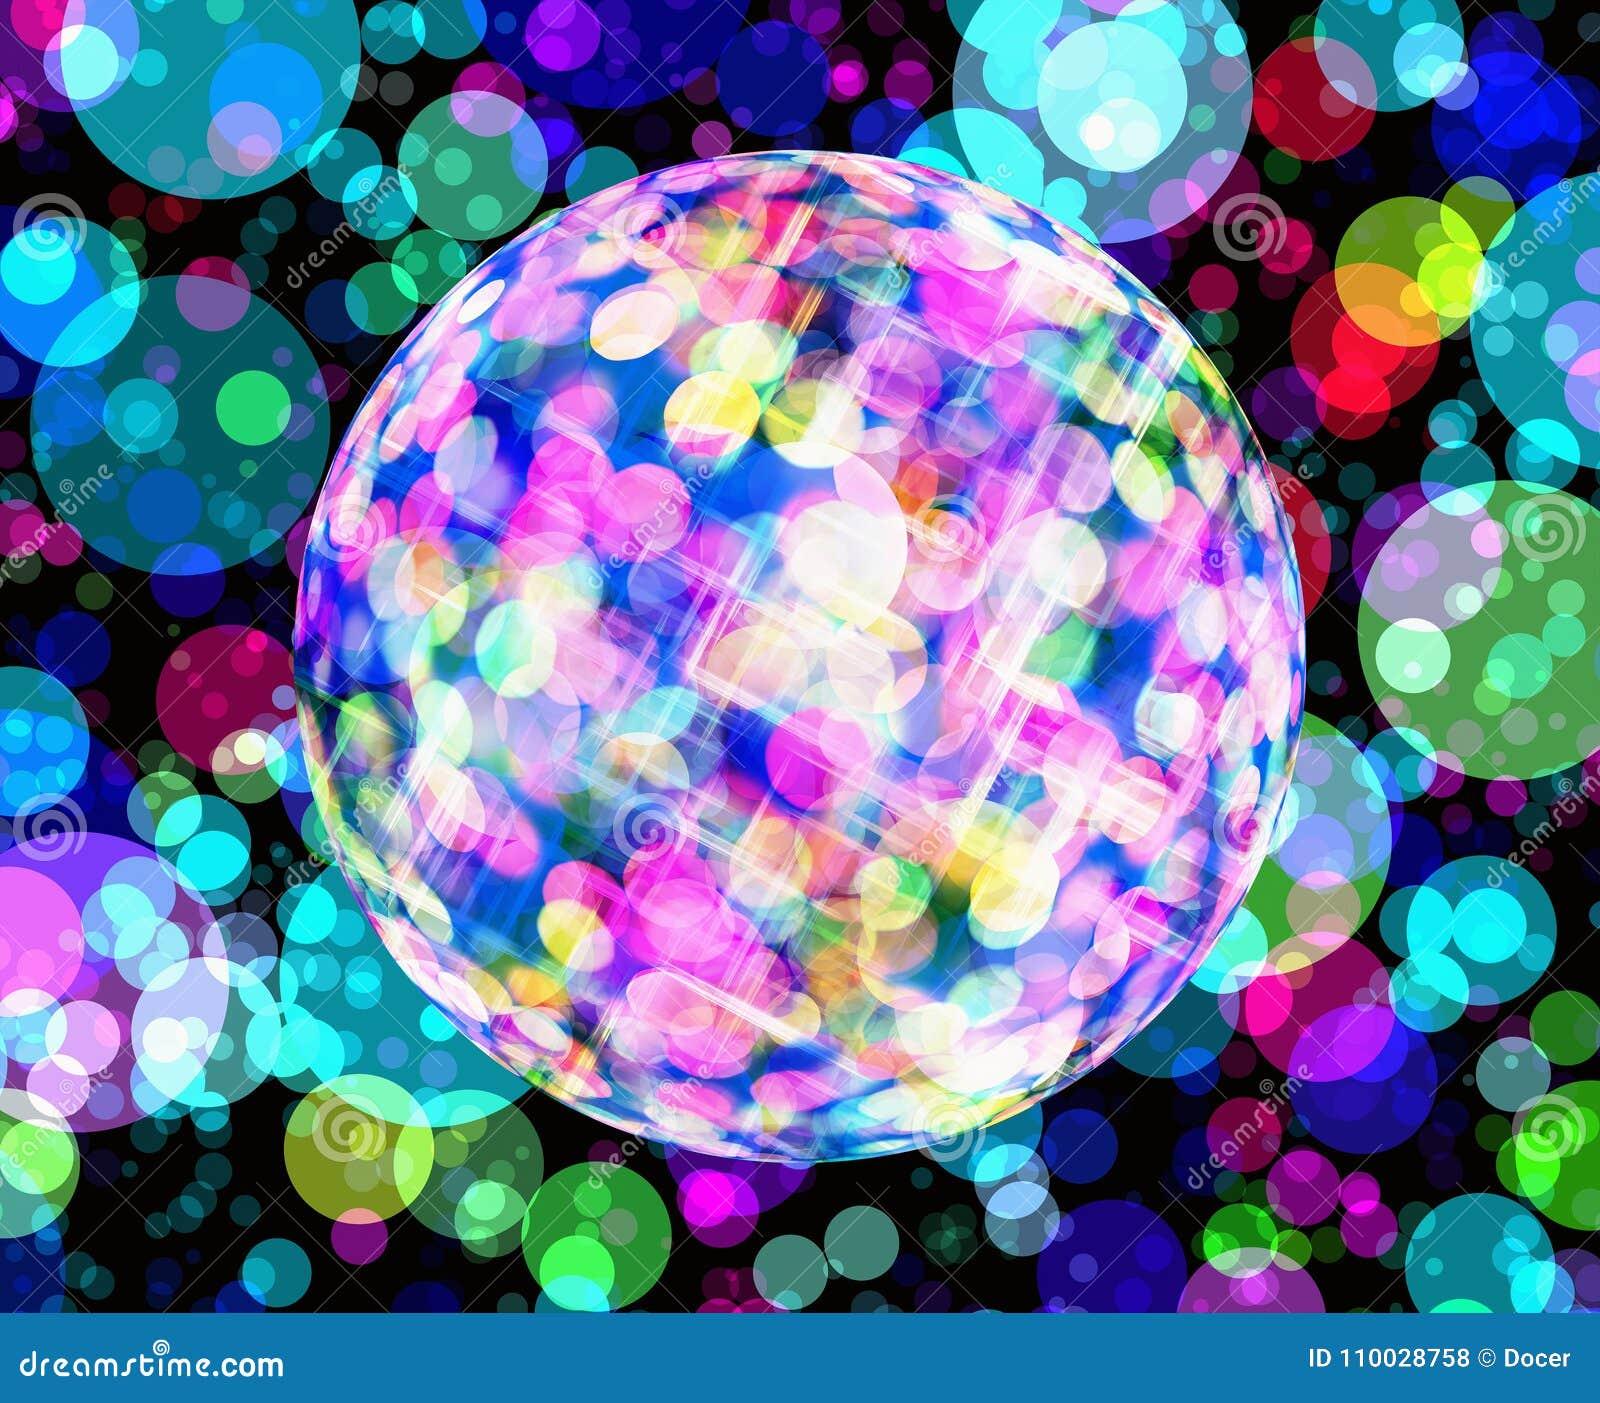 Multicolored discoballachtergronden